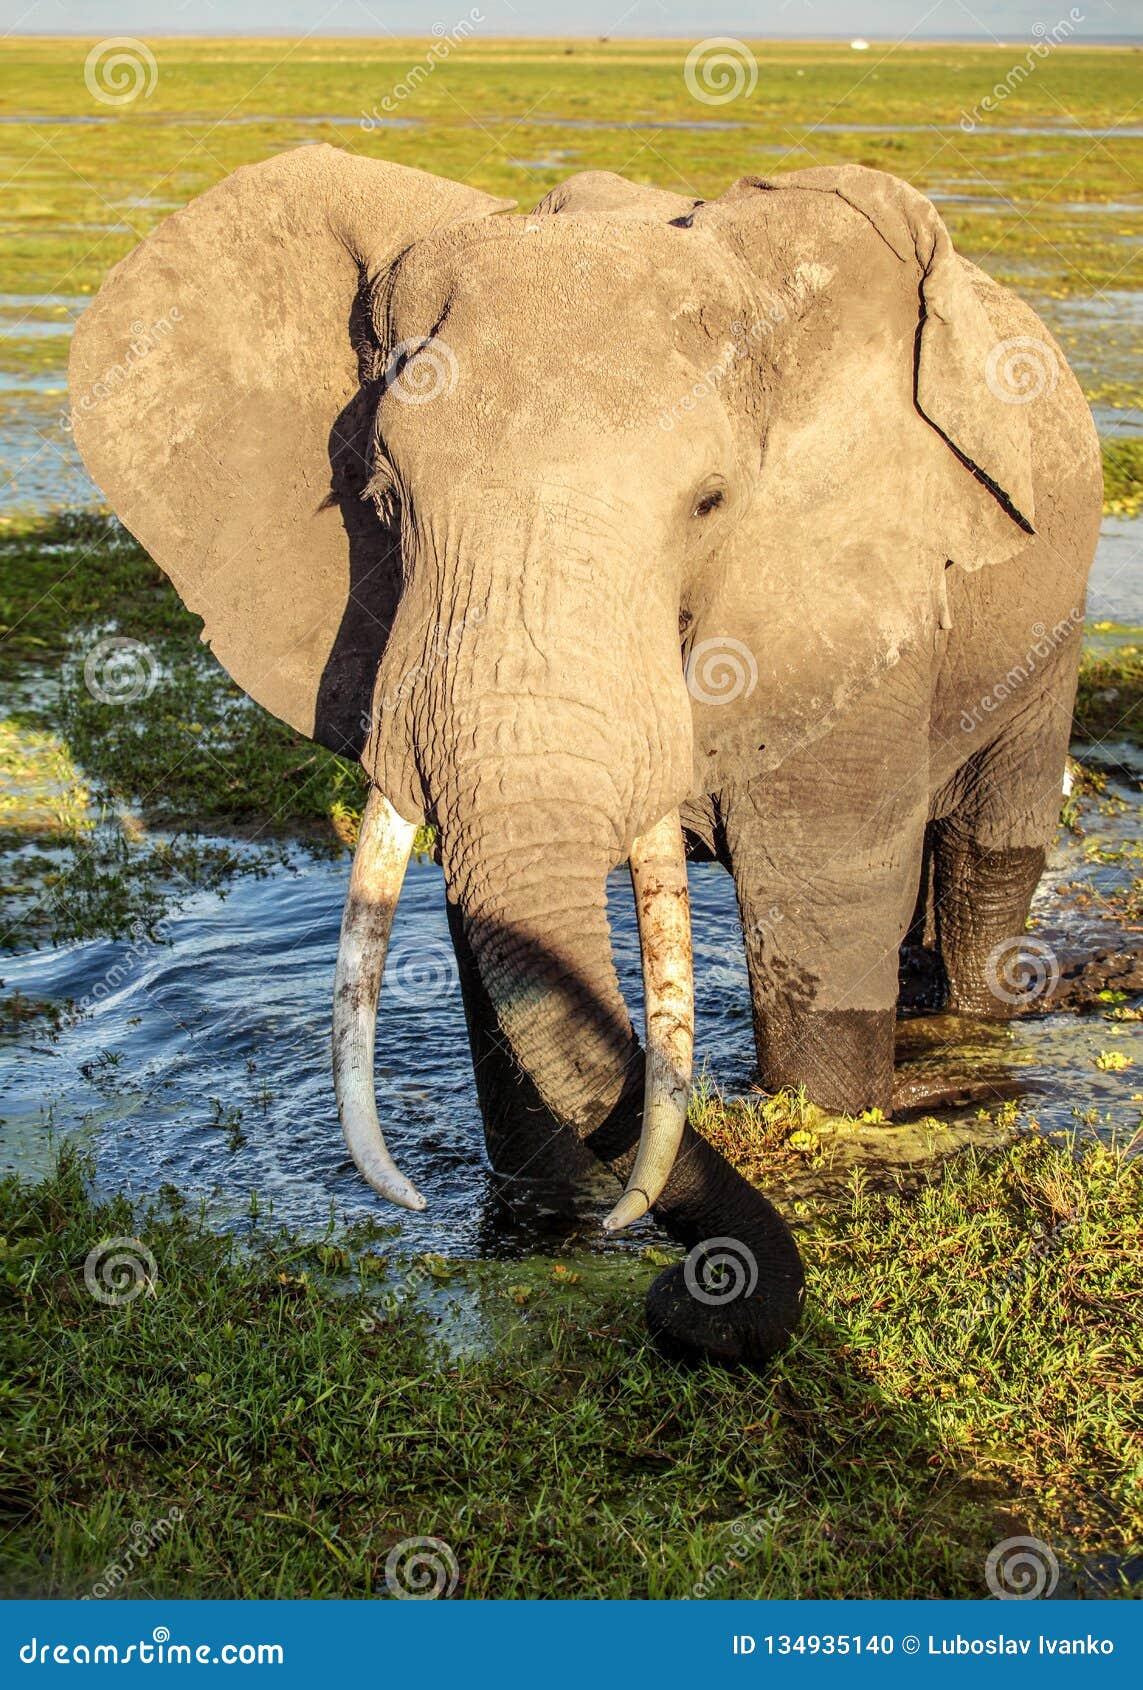 African bush elephant Loxodonta africana in wet swamp grass / shallow lake. Close encounter during safari in Amboseli park,